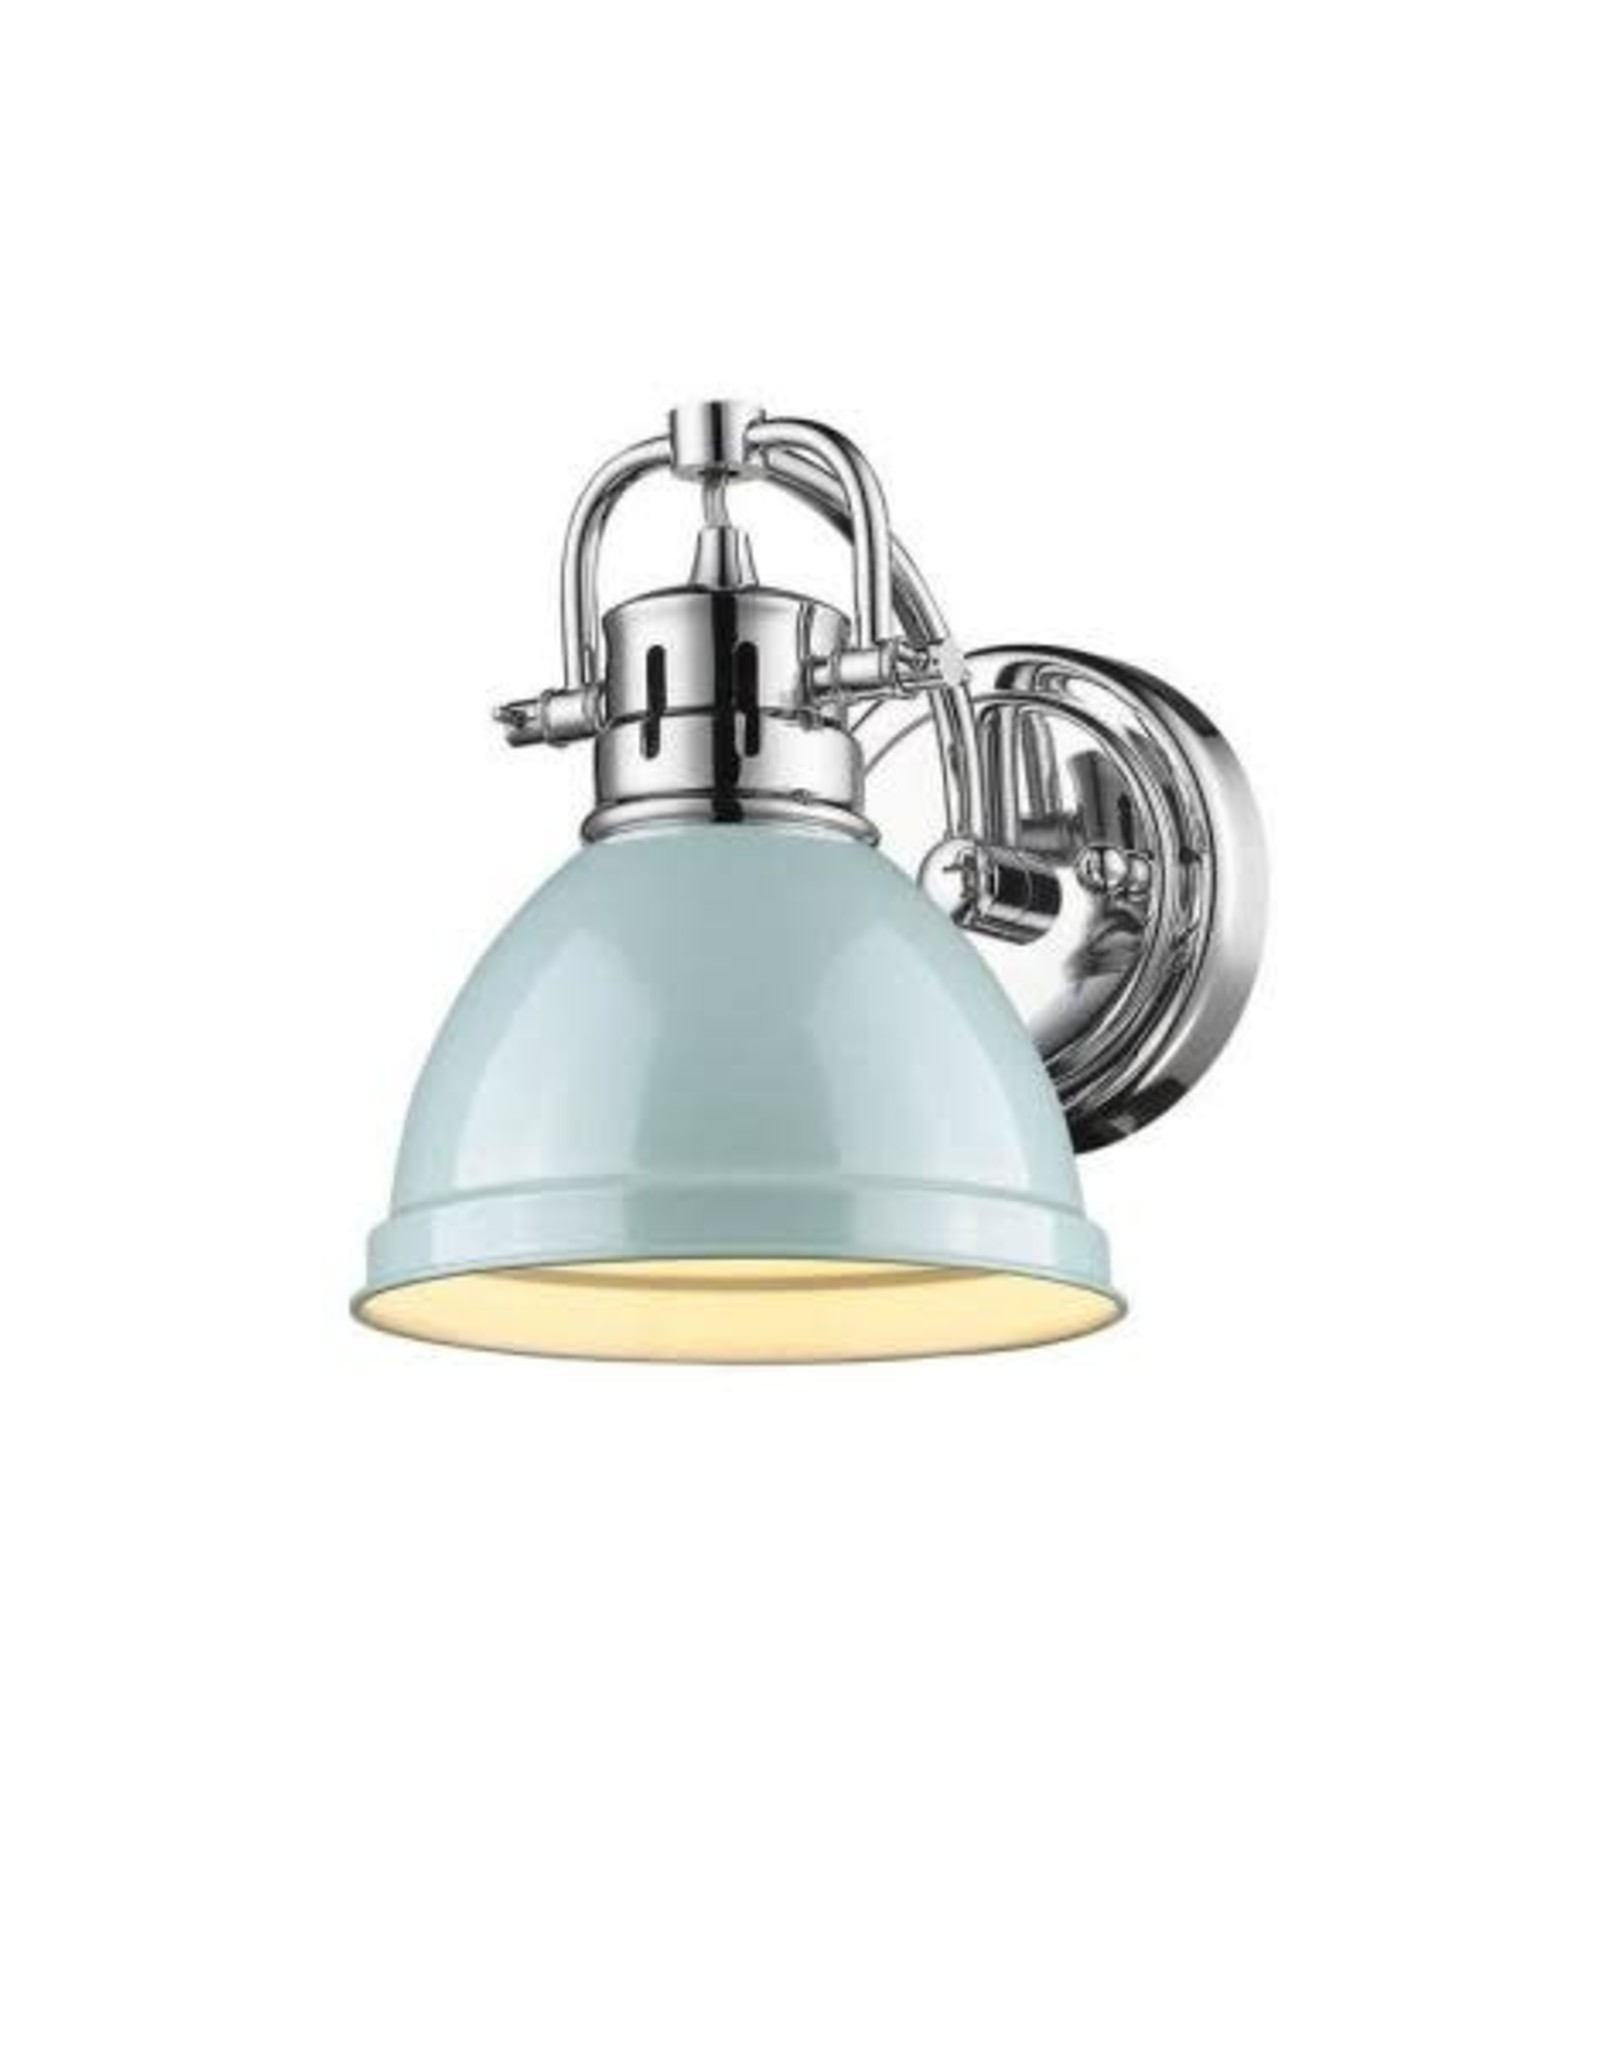 golden lighting duncan chrome 1 light bath light with seafoam shade